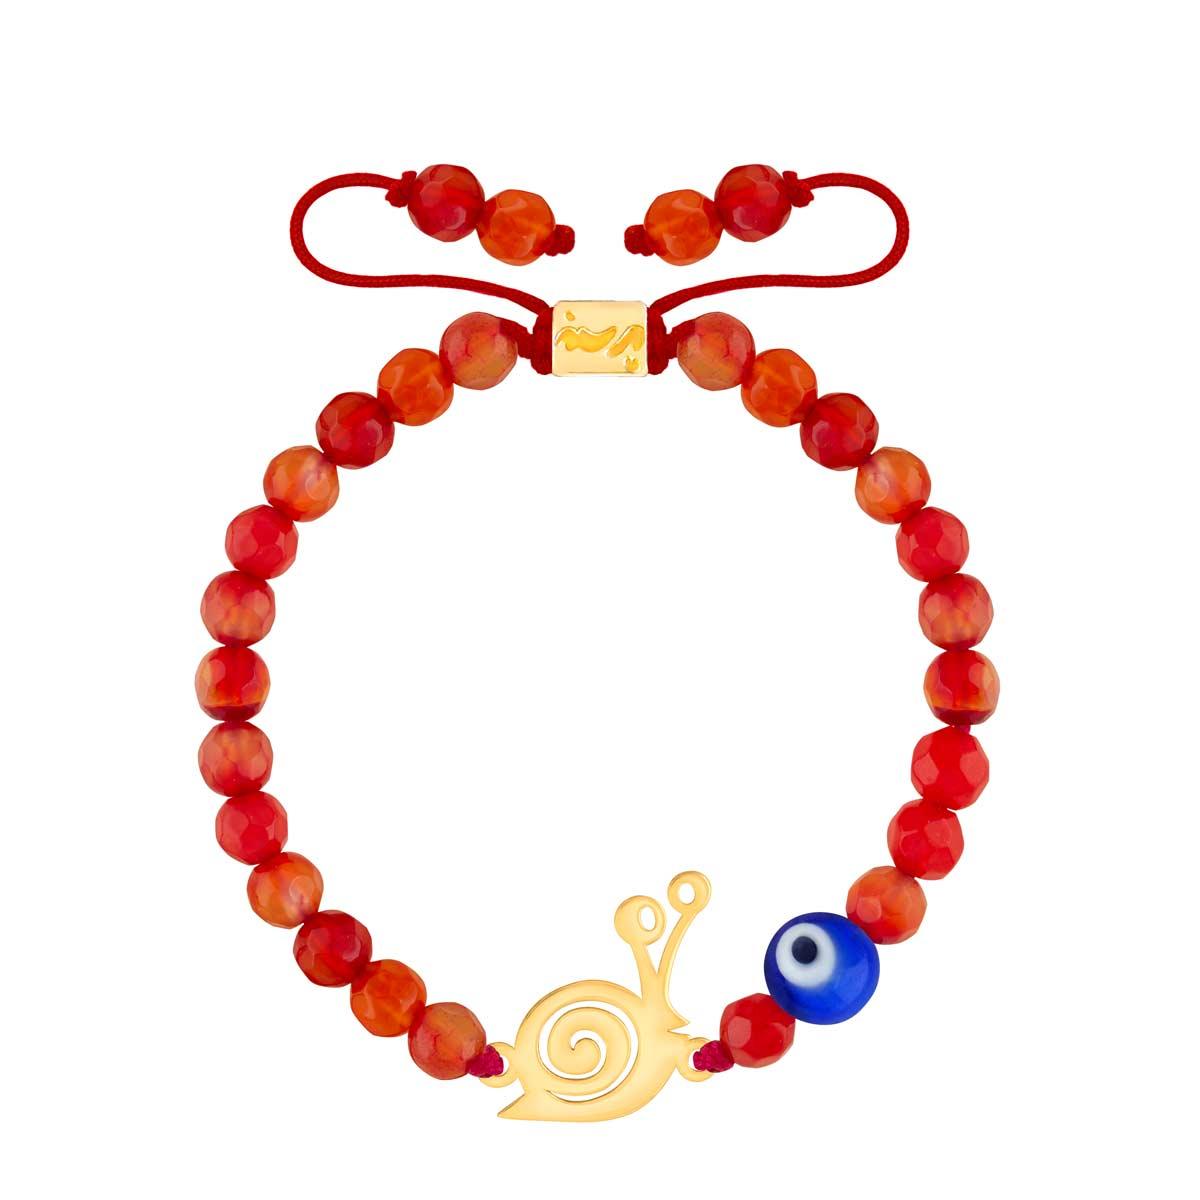 دستبند طلا بچه گانه سنگی حلزون